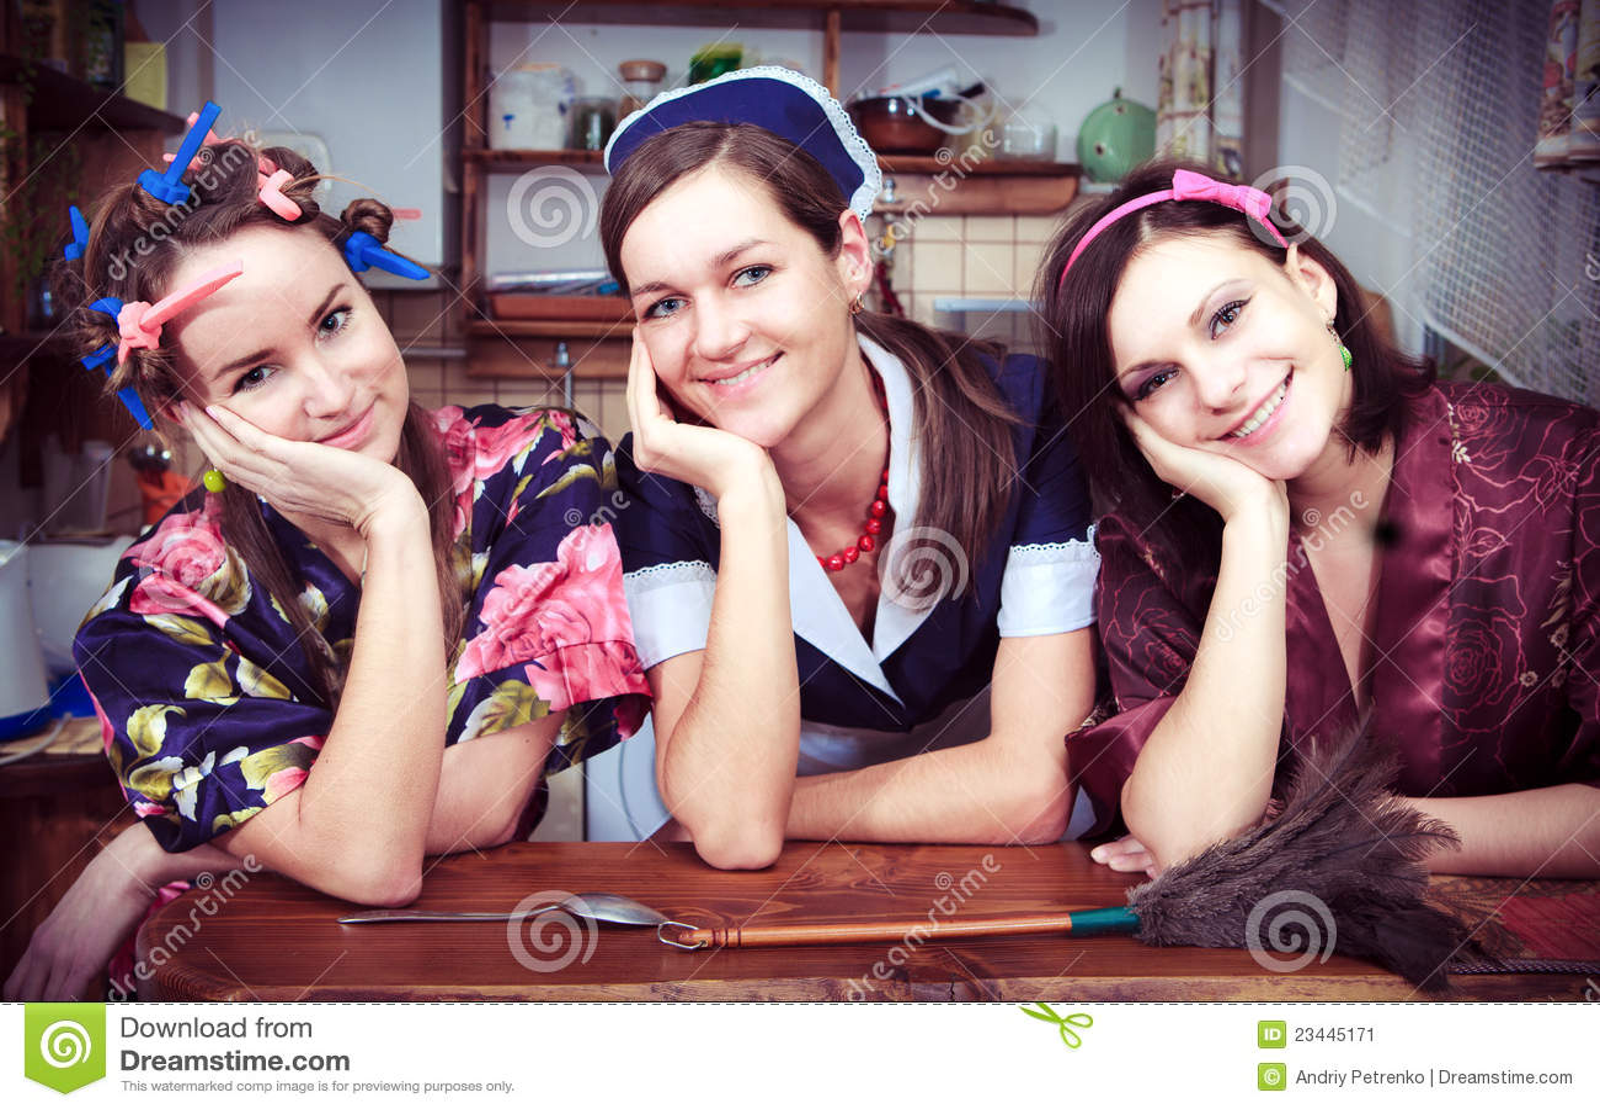 Three cheerful housewives